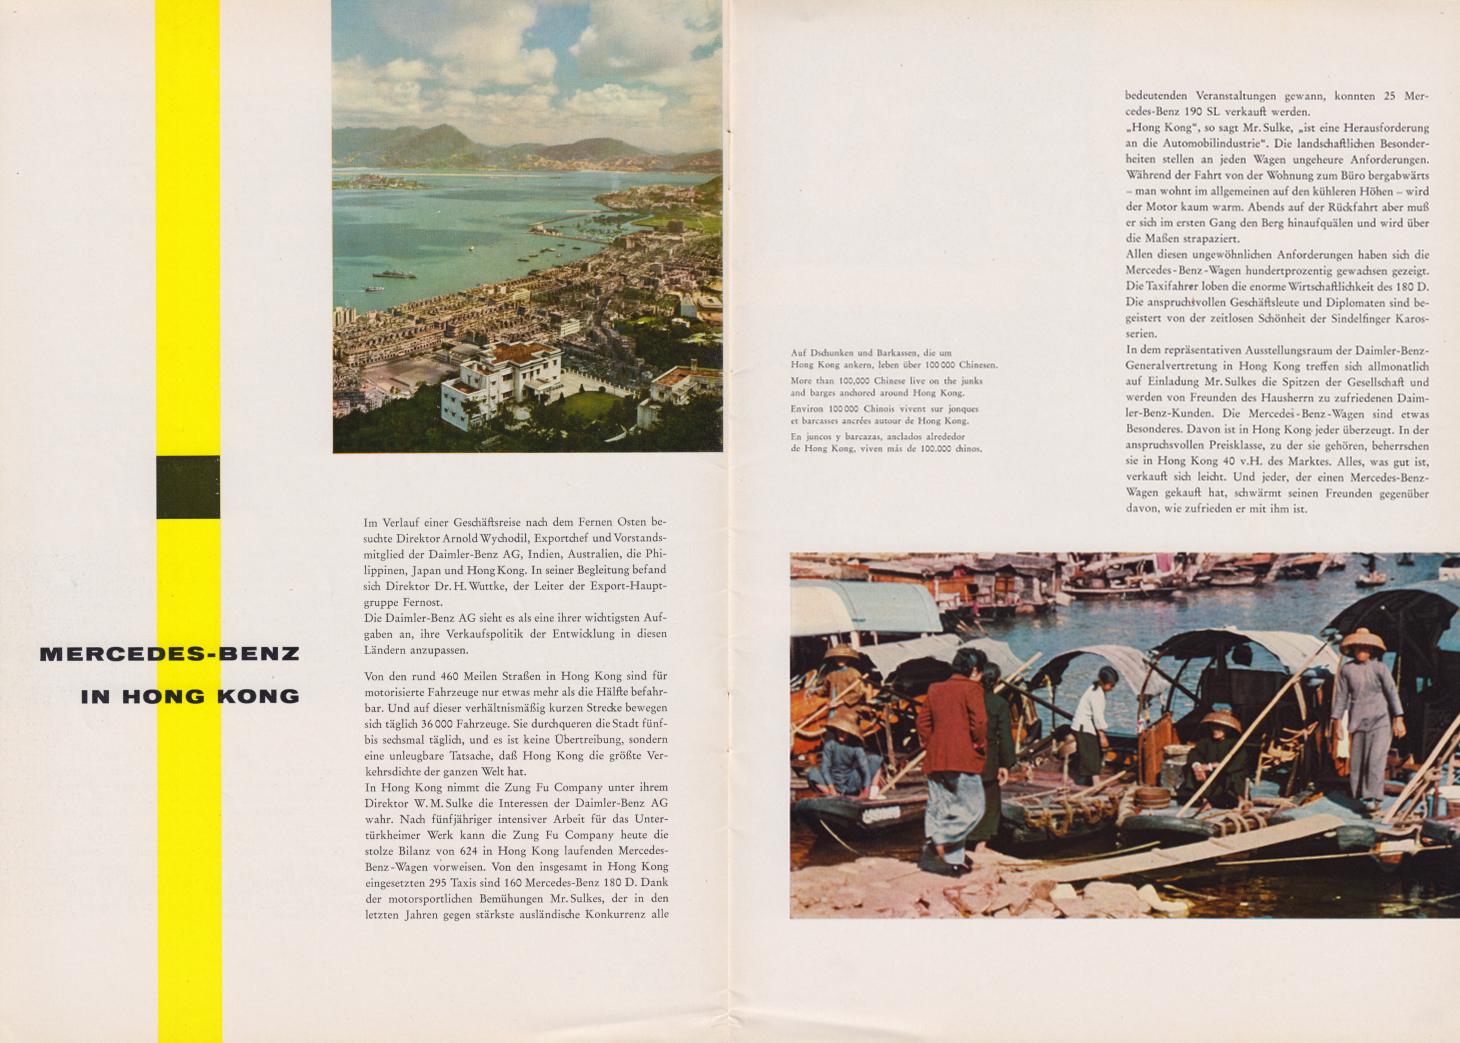 (REVISTA): Periódico In aller welt n.º 29 - Mercedes-Benz no mundo - 1959 - multilingue 003